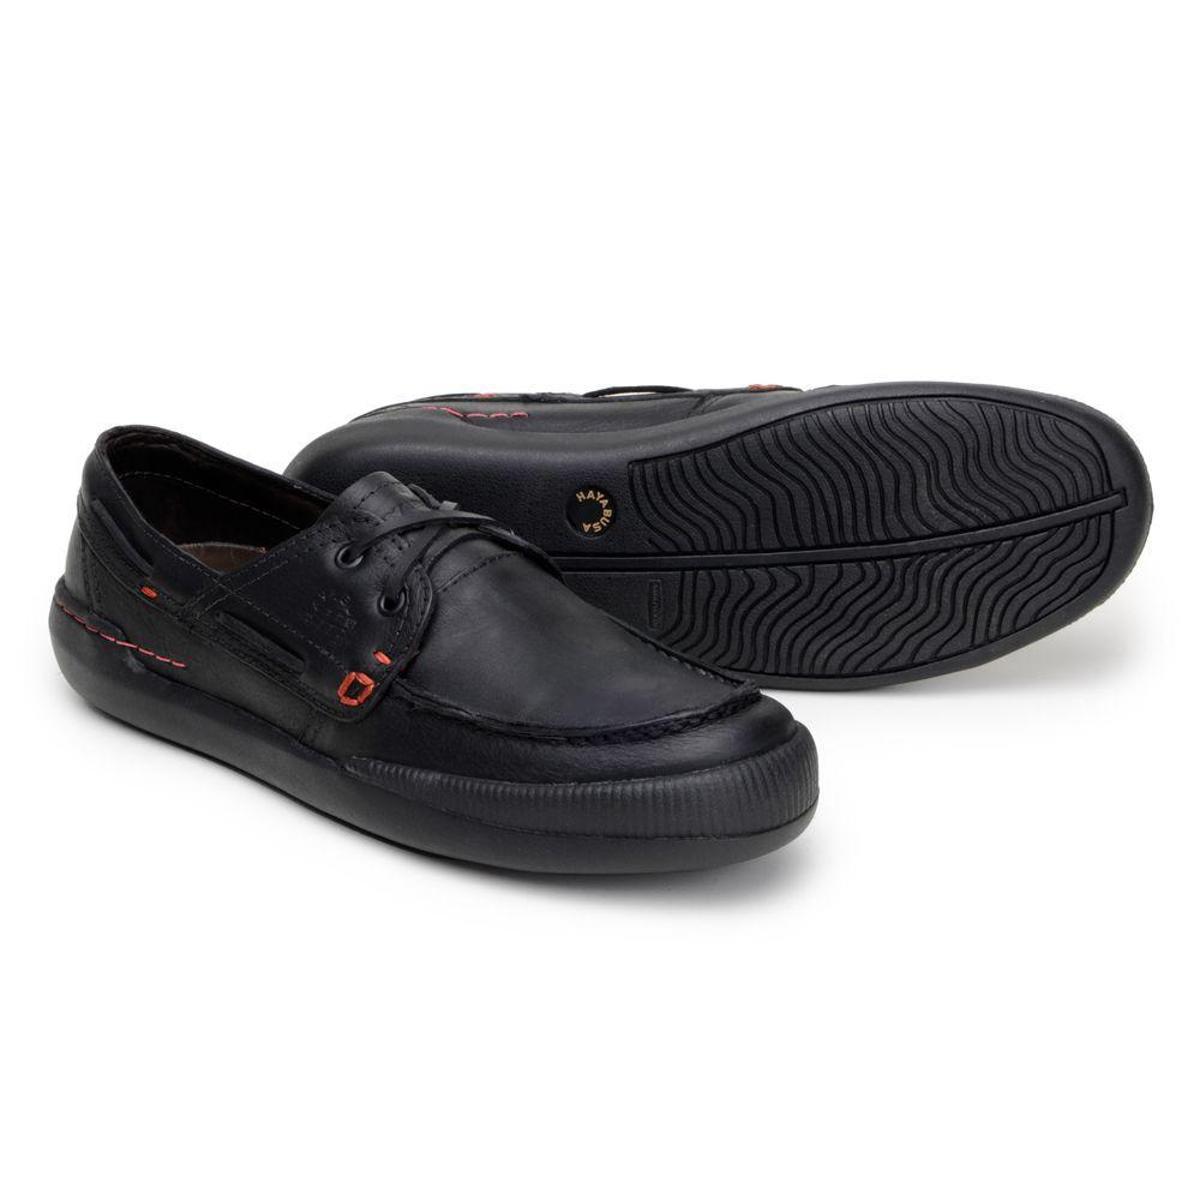 Sapato Em Couro Hayabusa Z 20 - Masculino - Preto